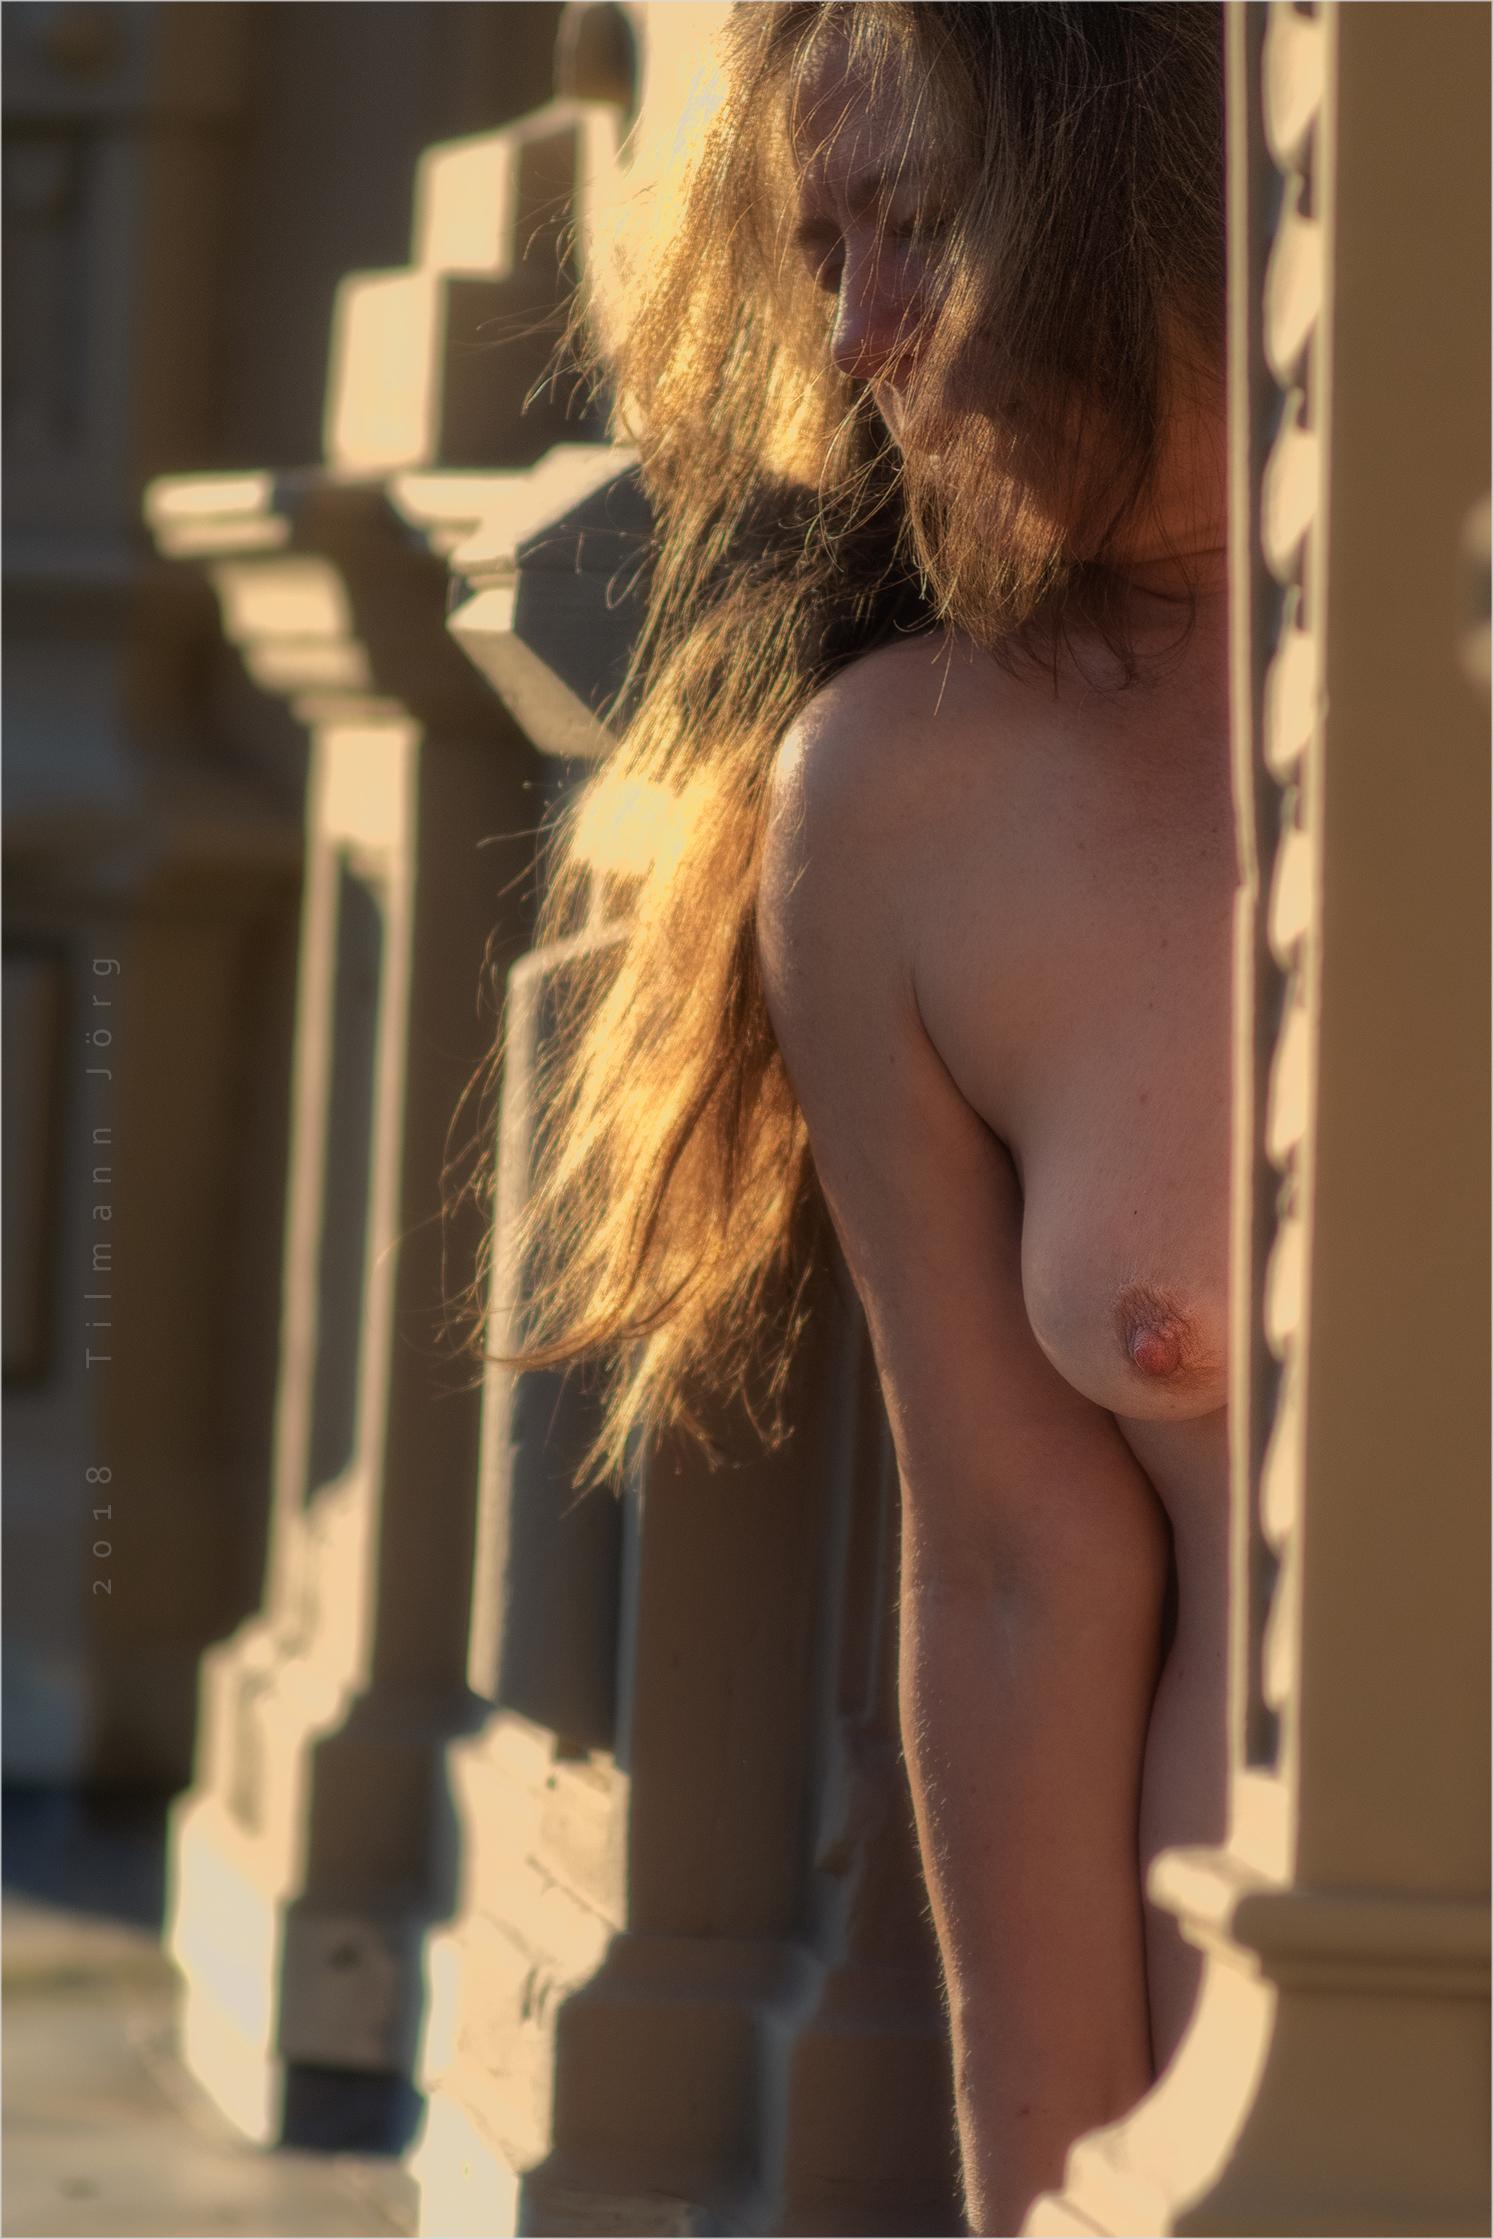 nackte frau lehnt aus dem fenster